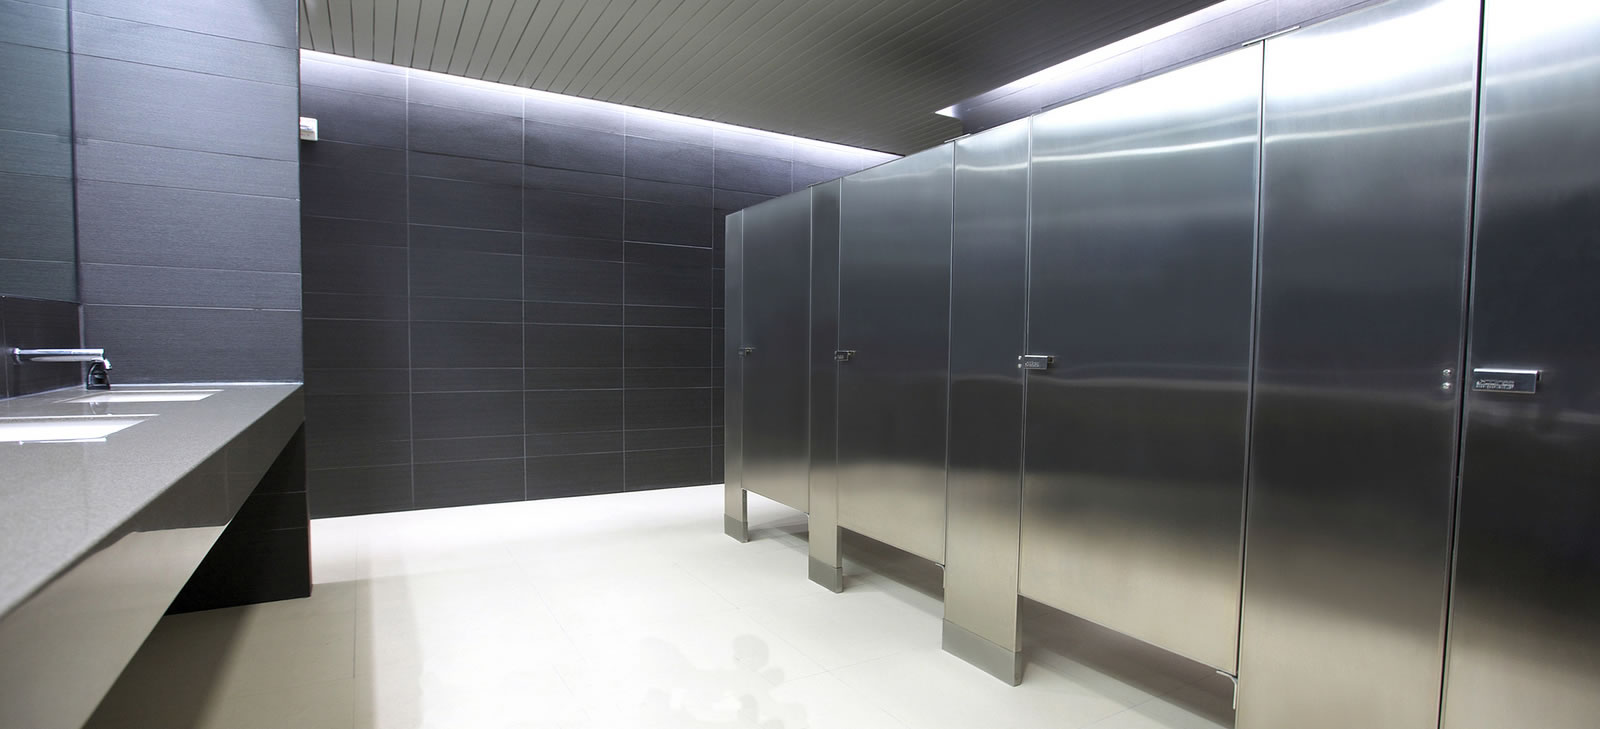 Baño Publico Medidas Minimas:Mamparas para sanitarios públicos, Mamparas sanitarias, Sanilock